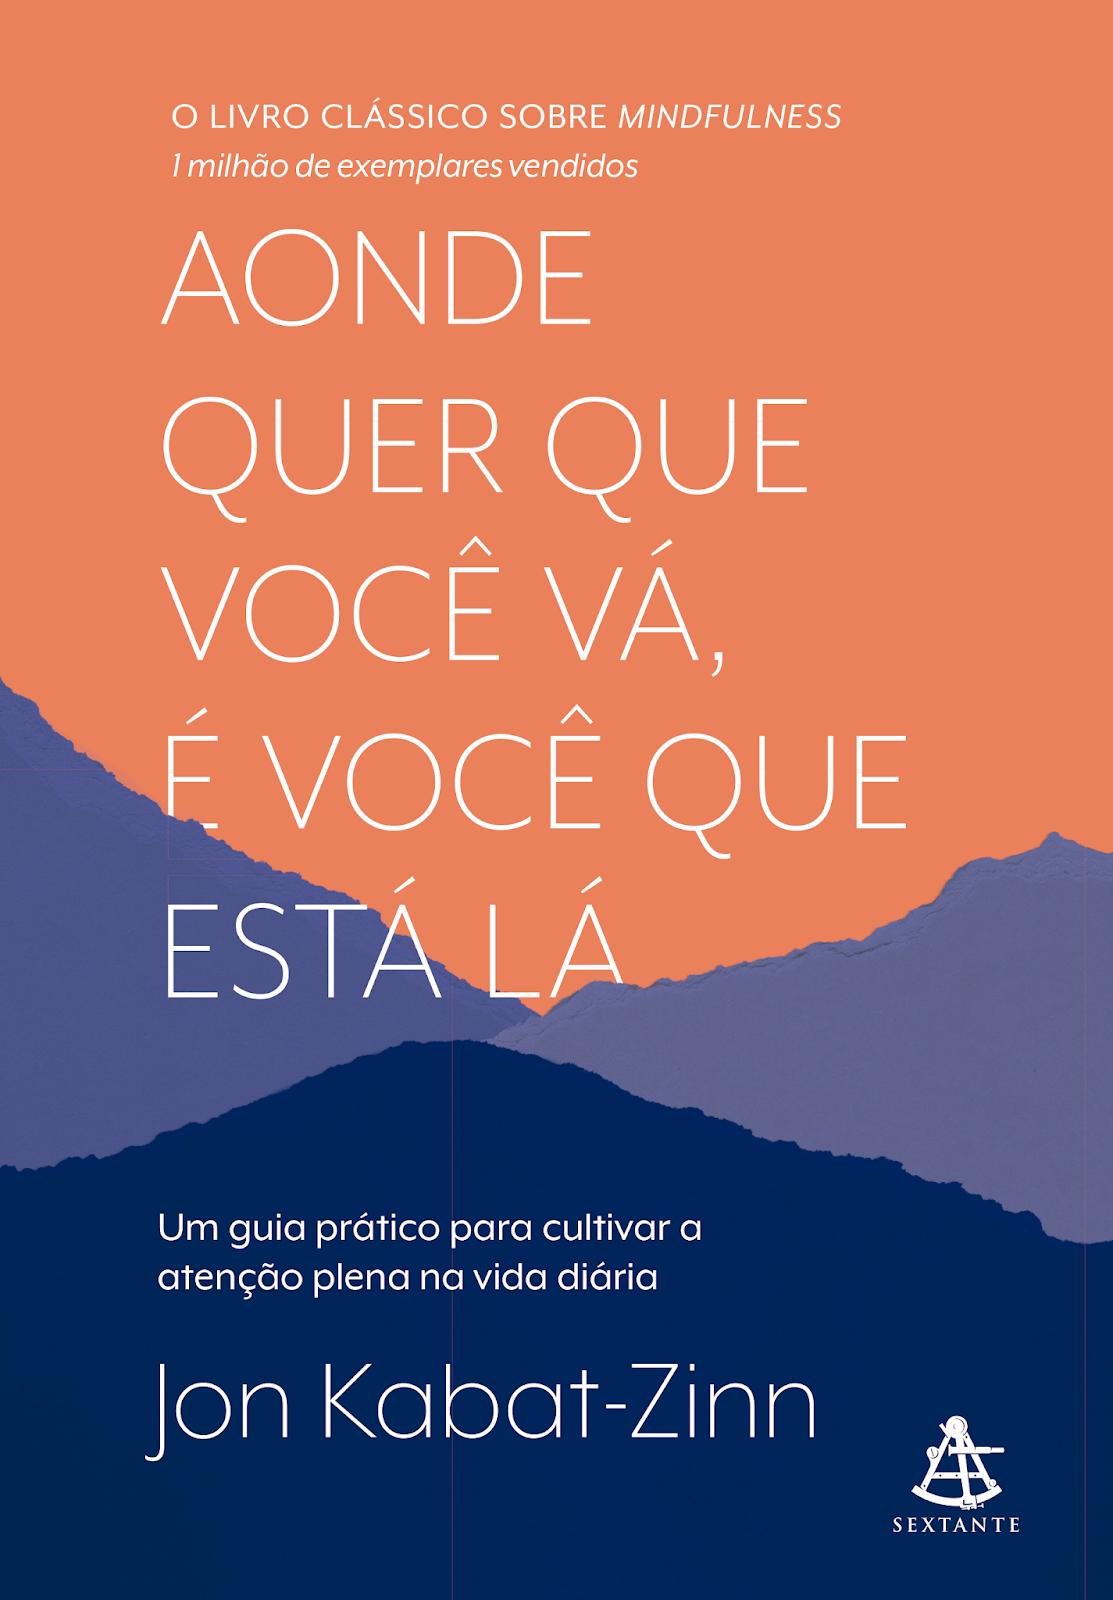 Kakuro - Livro de Puzzle de B. T. Batsford | Mulher Portuguesa